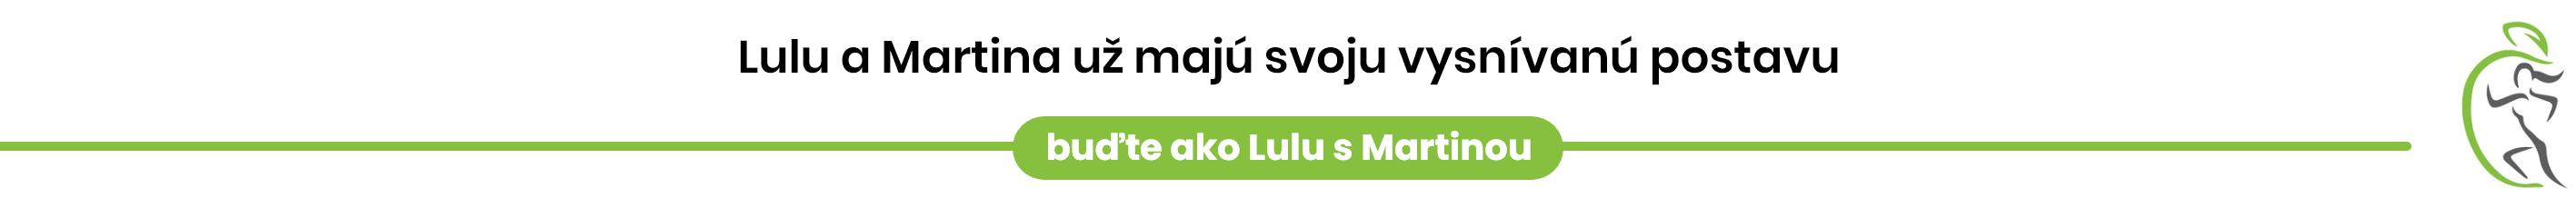 Lulu a Martina